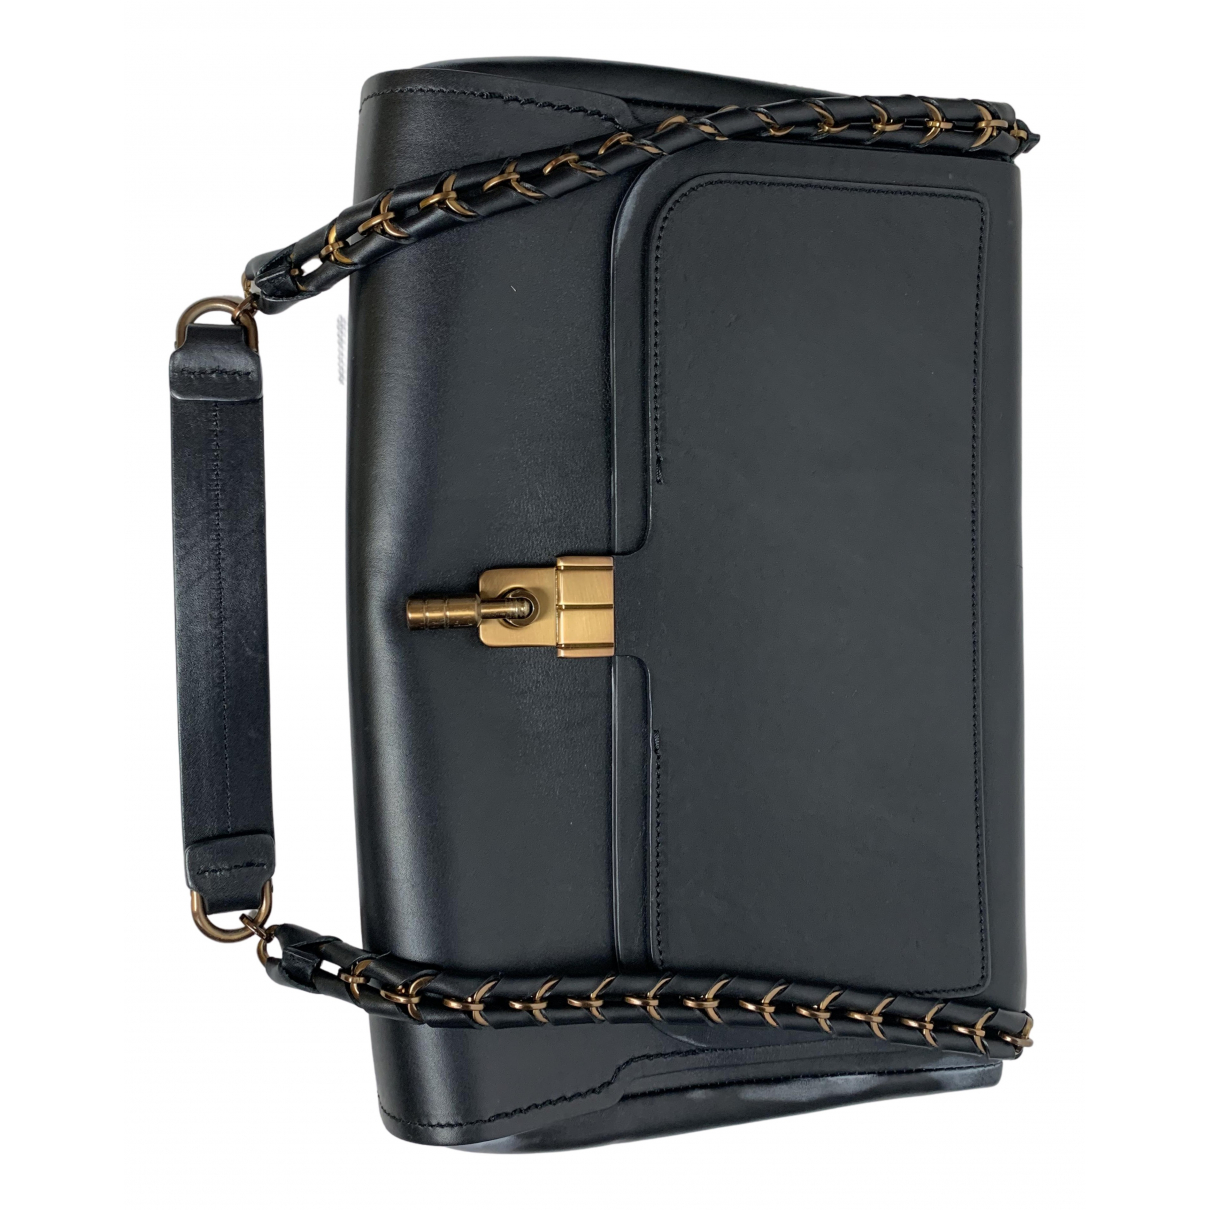 Lanvin \N Black Leather handbag for Women \N